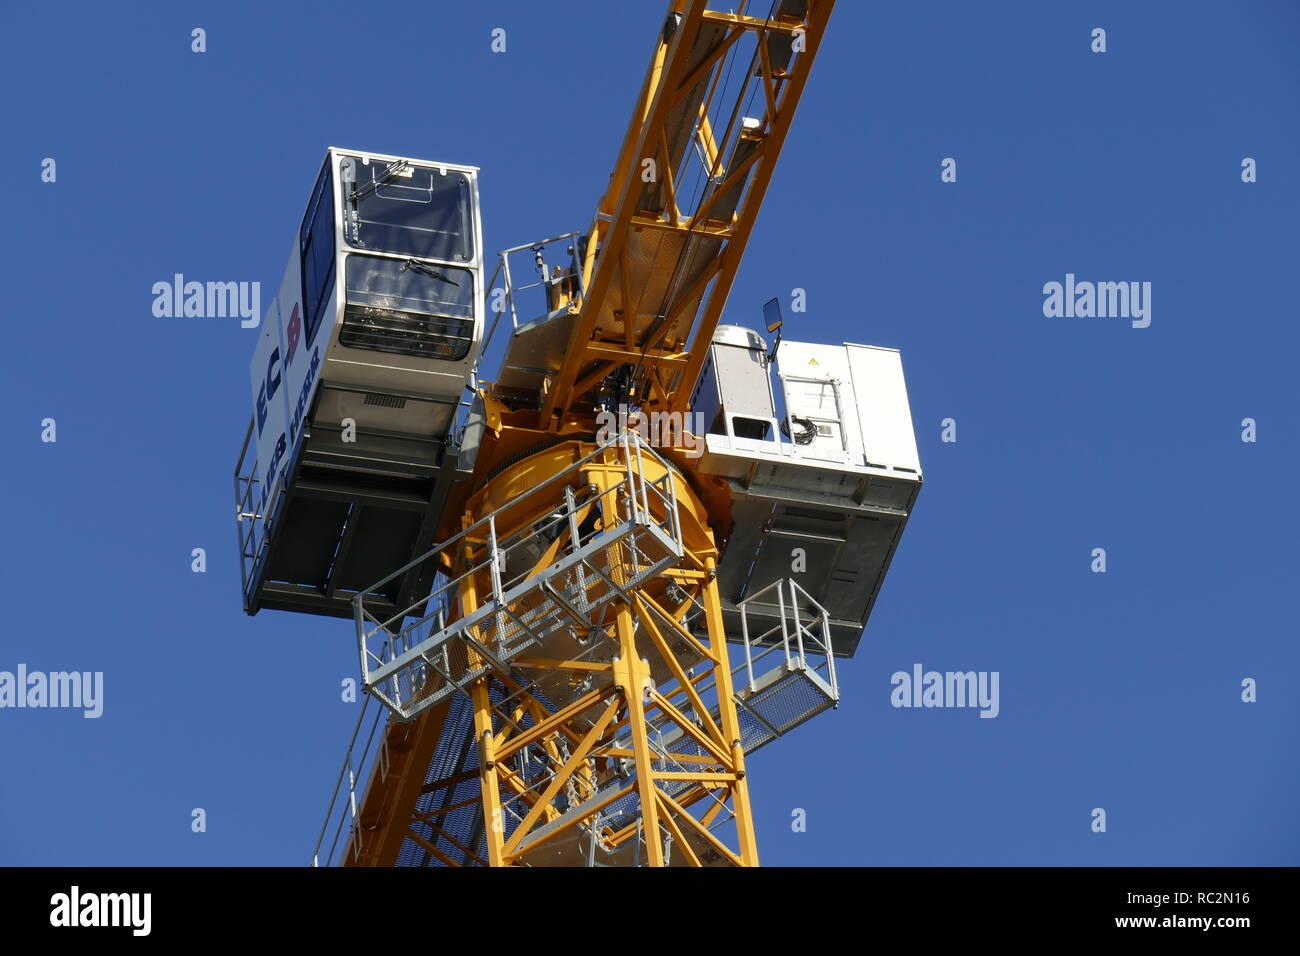 Construction crane in Bremen's Überseestadt, Bremen, Germany, Europe I Baukran in der Bremer Überseestadt,  Bremen, Deutschland, Europa - Stock Image